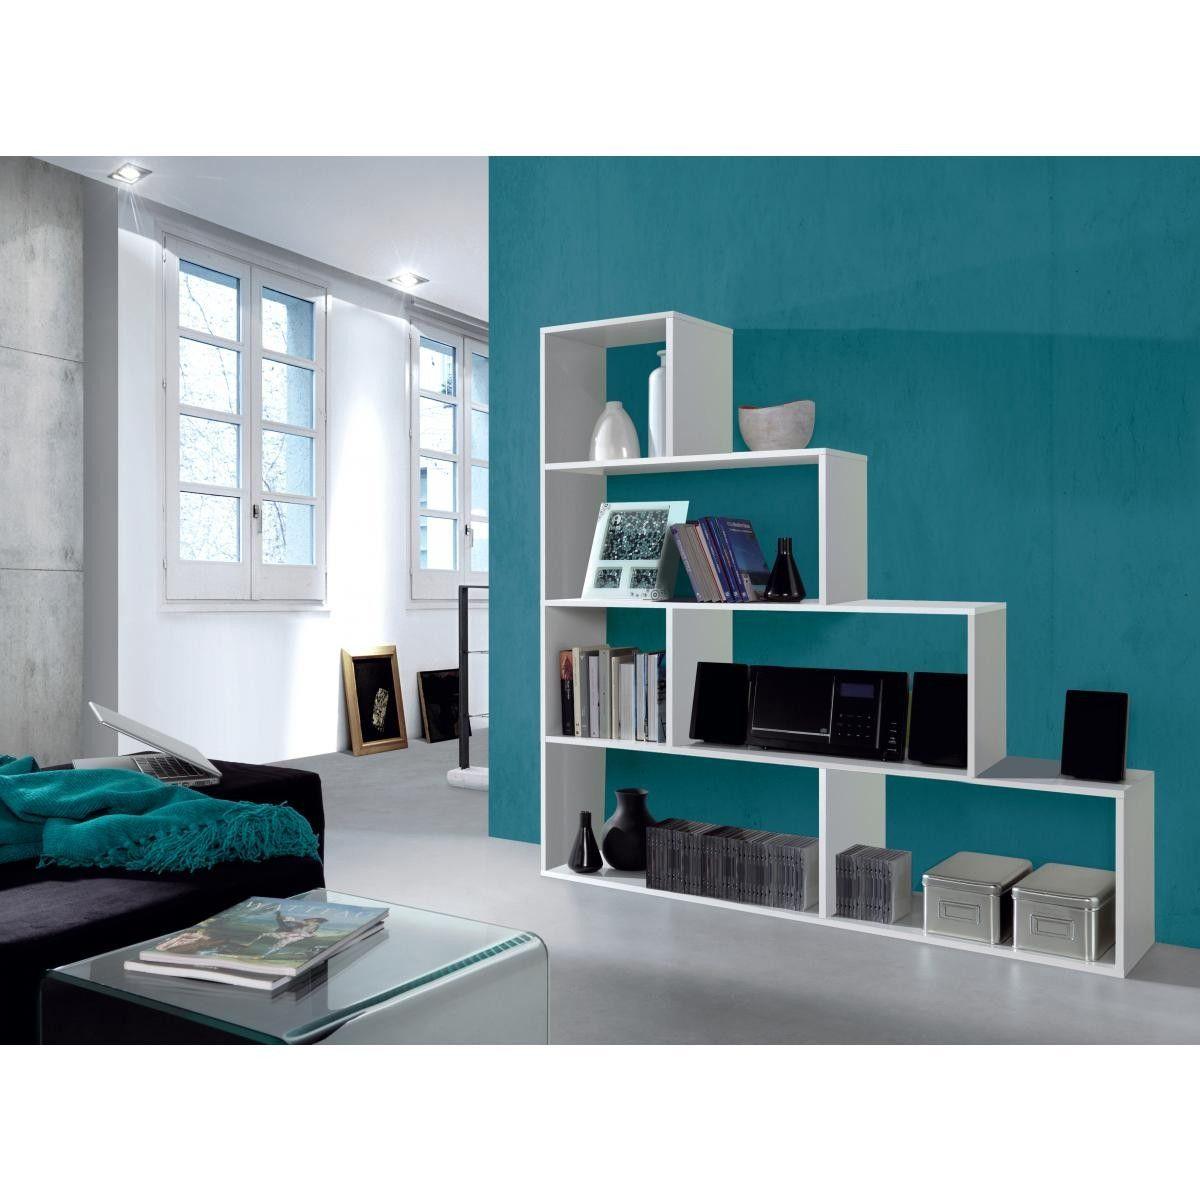 estanter a step en conforama home sweet home pinterest tag re meuble tag re et meuble. Black Bedroom Furniture Sets. Home Design Ideas